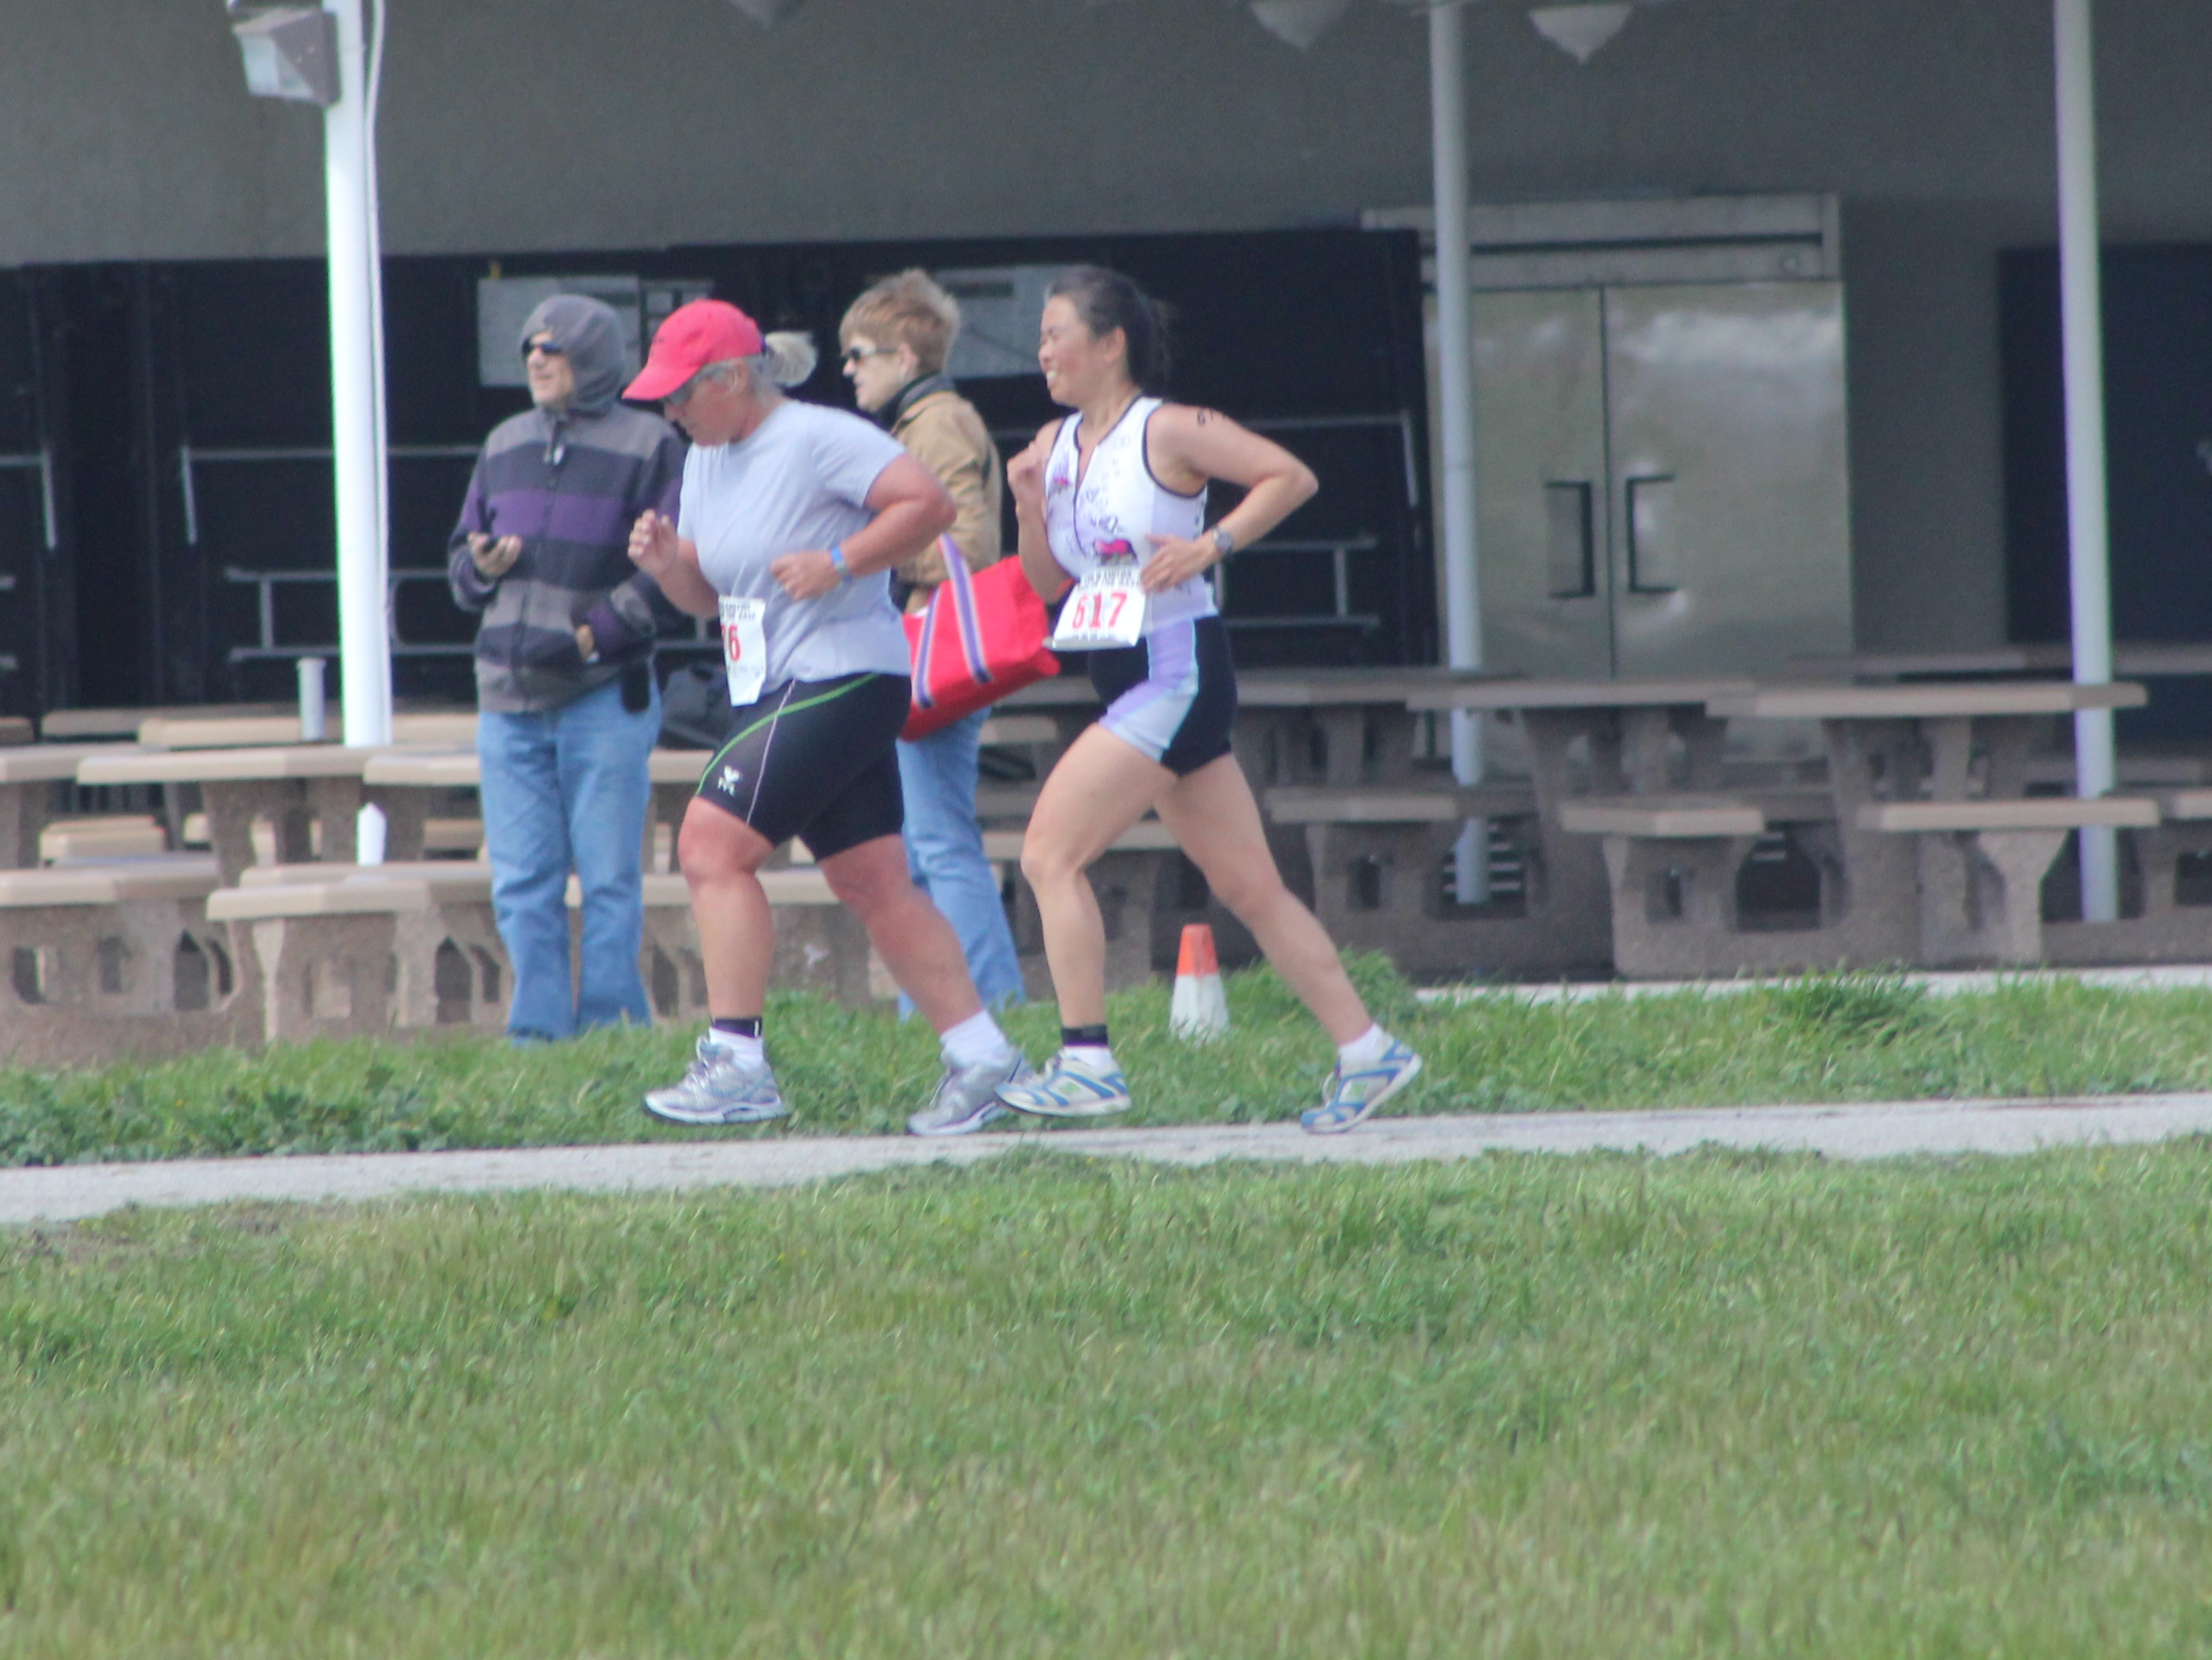 Cathy running